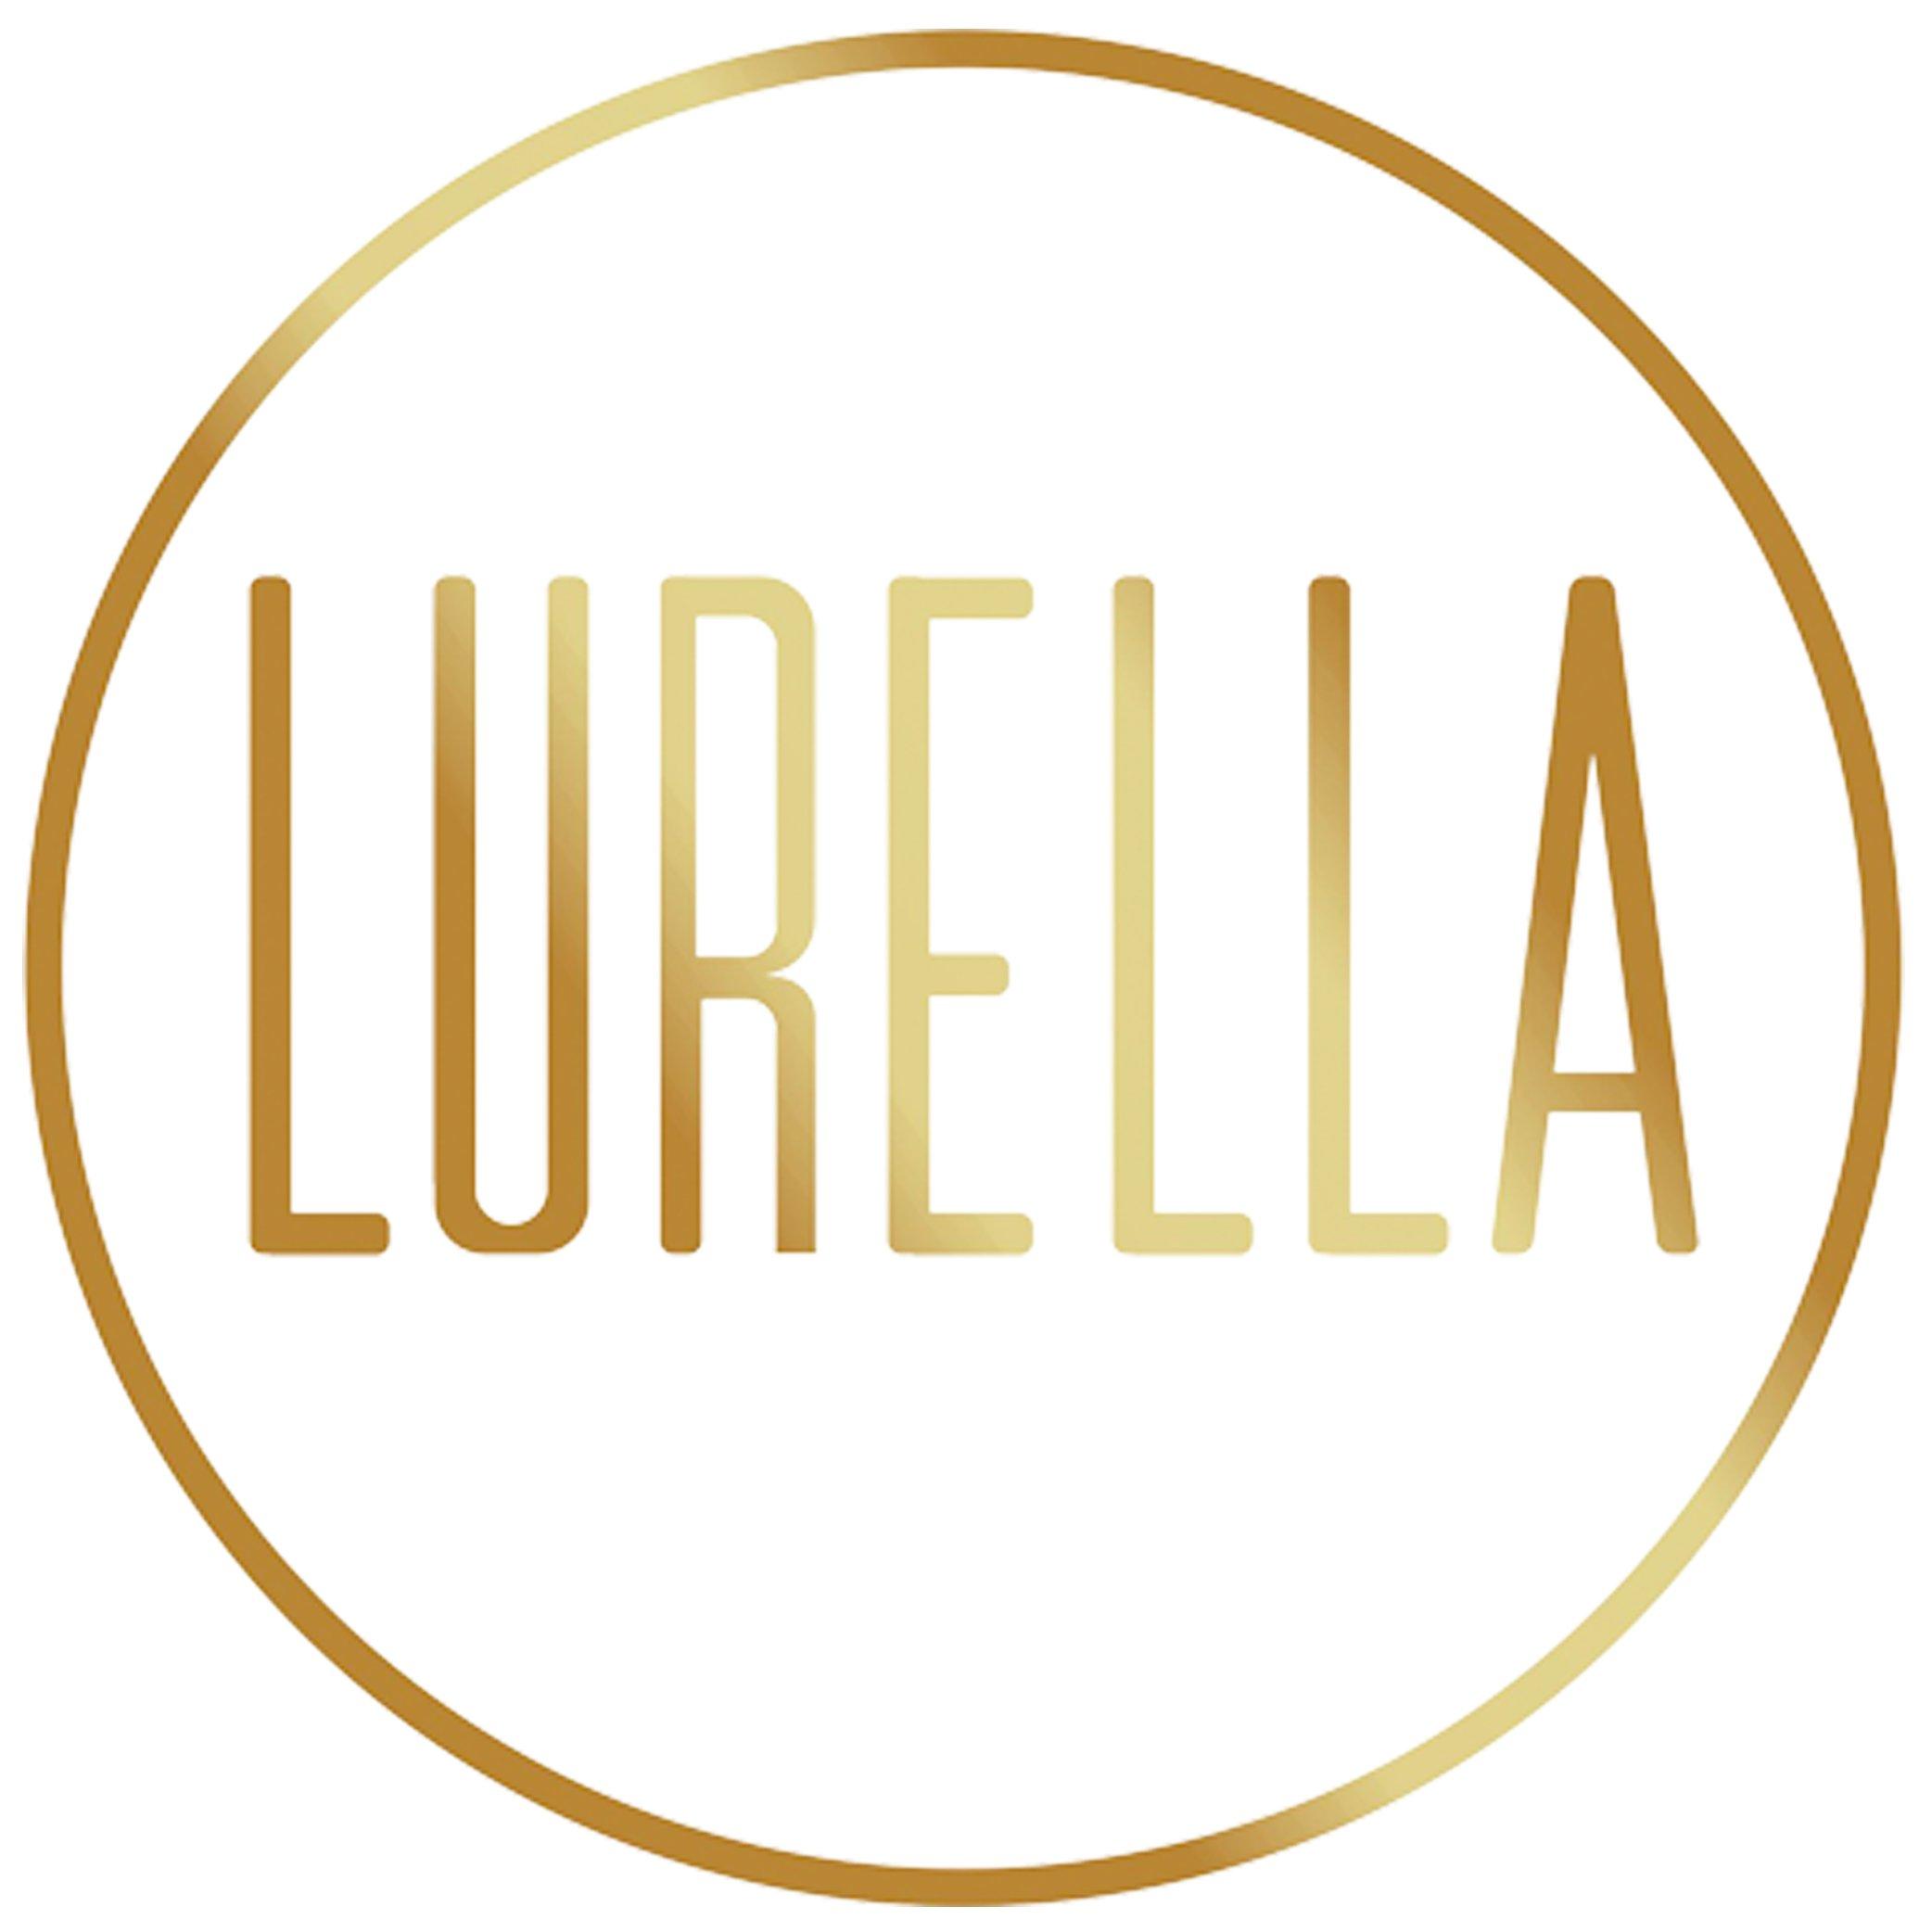 Lurella's logo